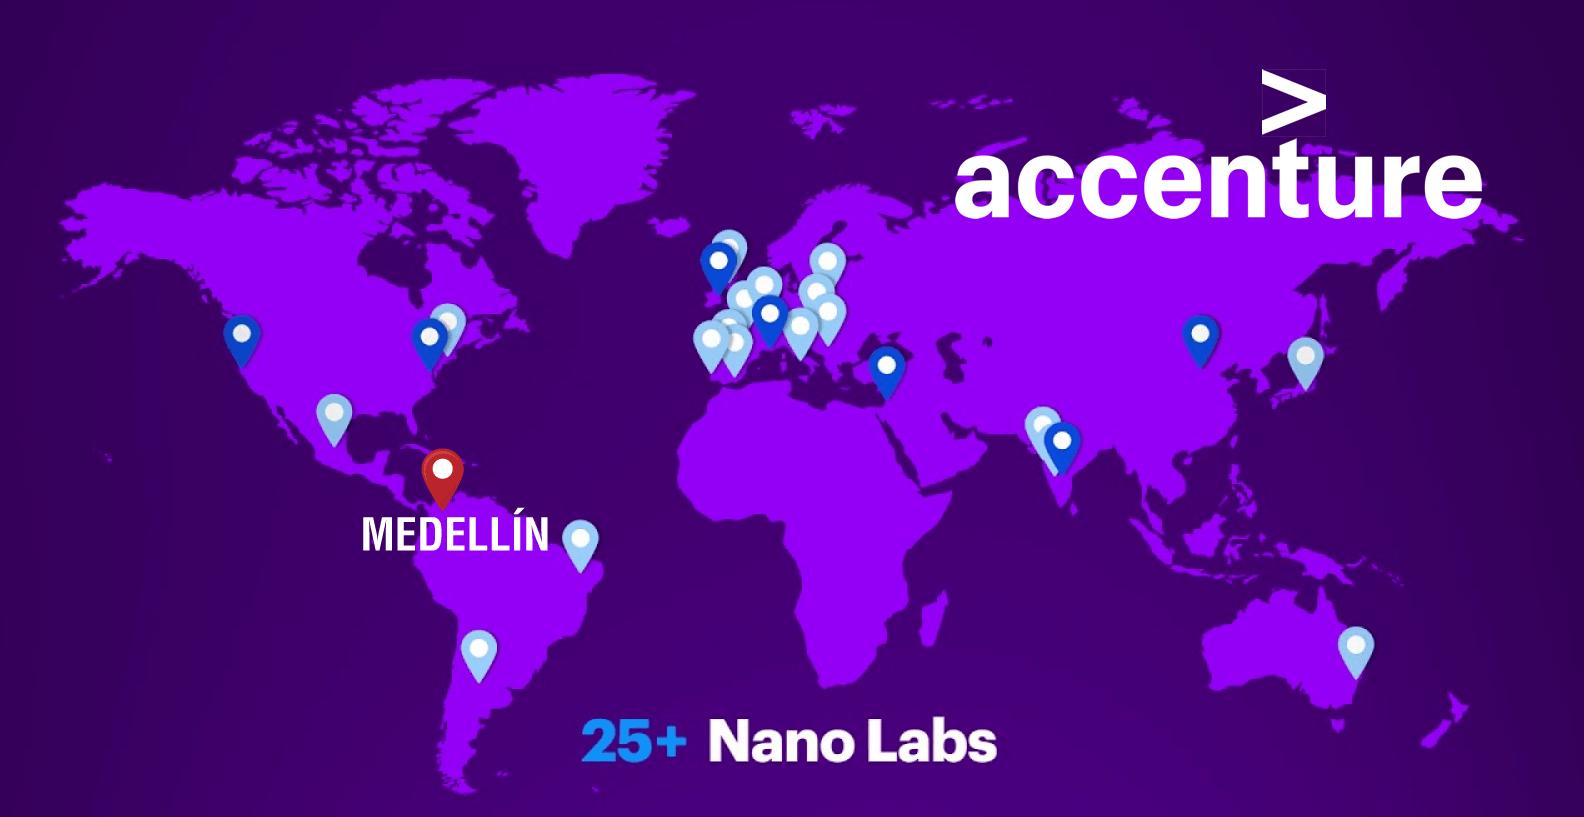 Nanolabs Accenture en Medellín